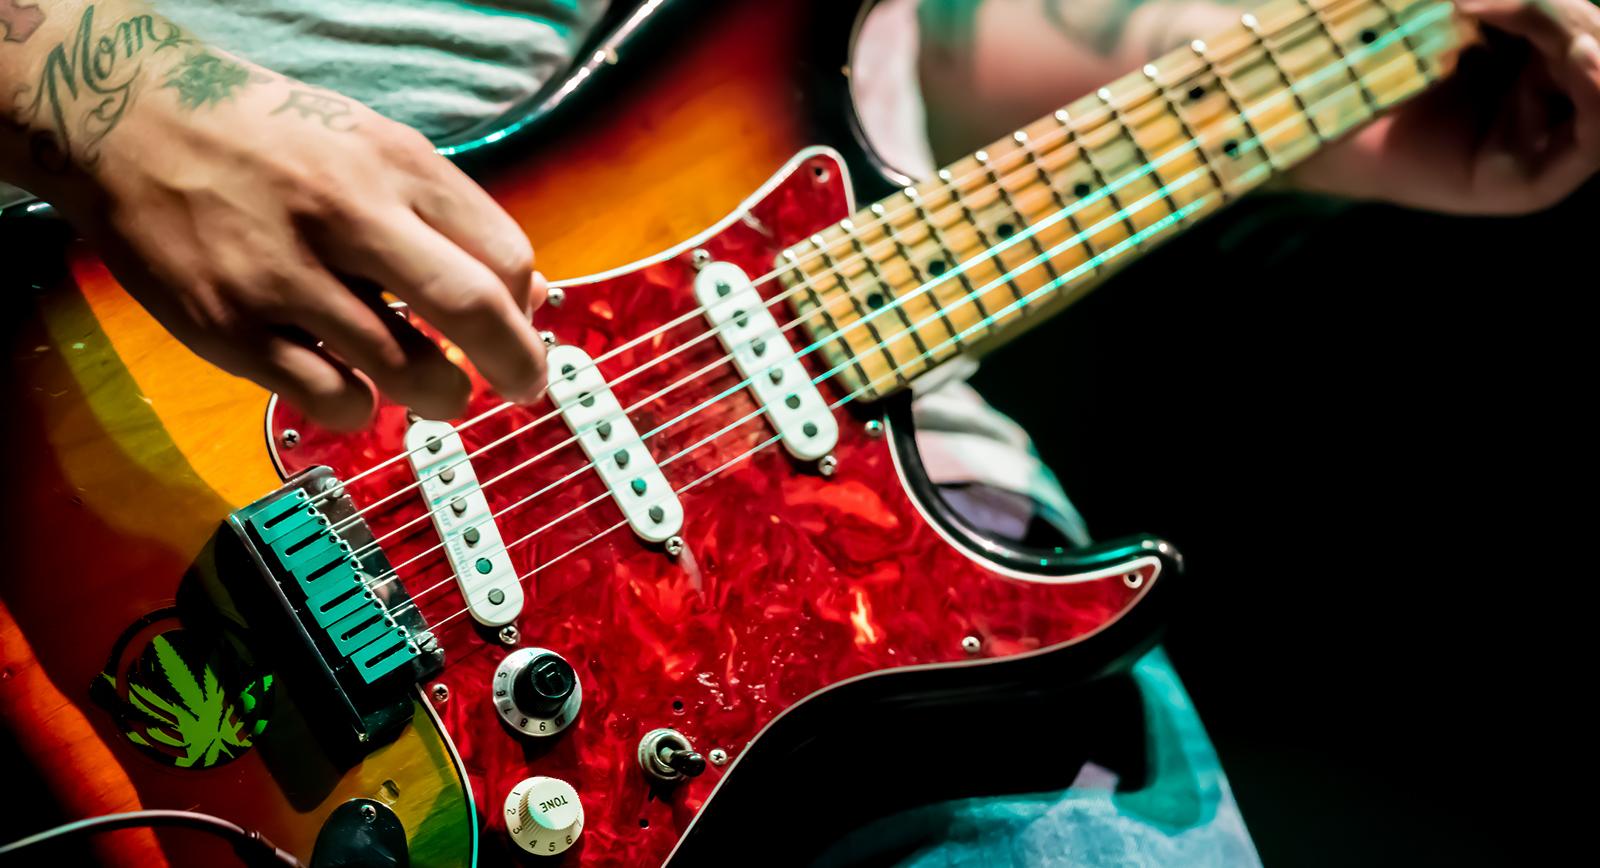 Sublime-with-Rome-2016-Tour-Concert-Review-Photos-Ironstone-Richter-Entertainment-Group-FI